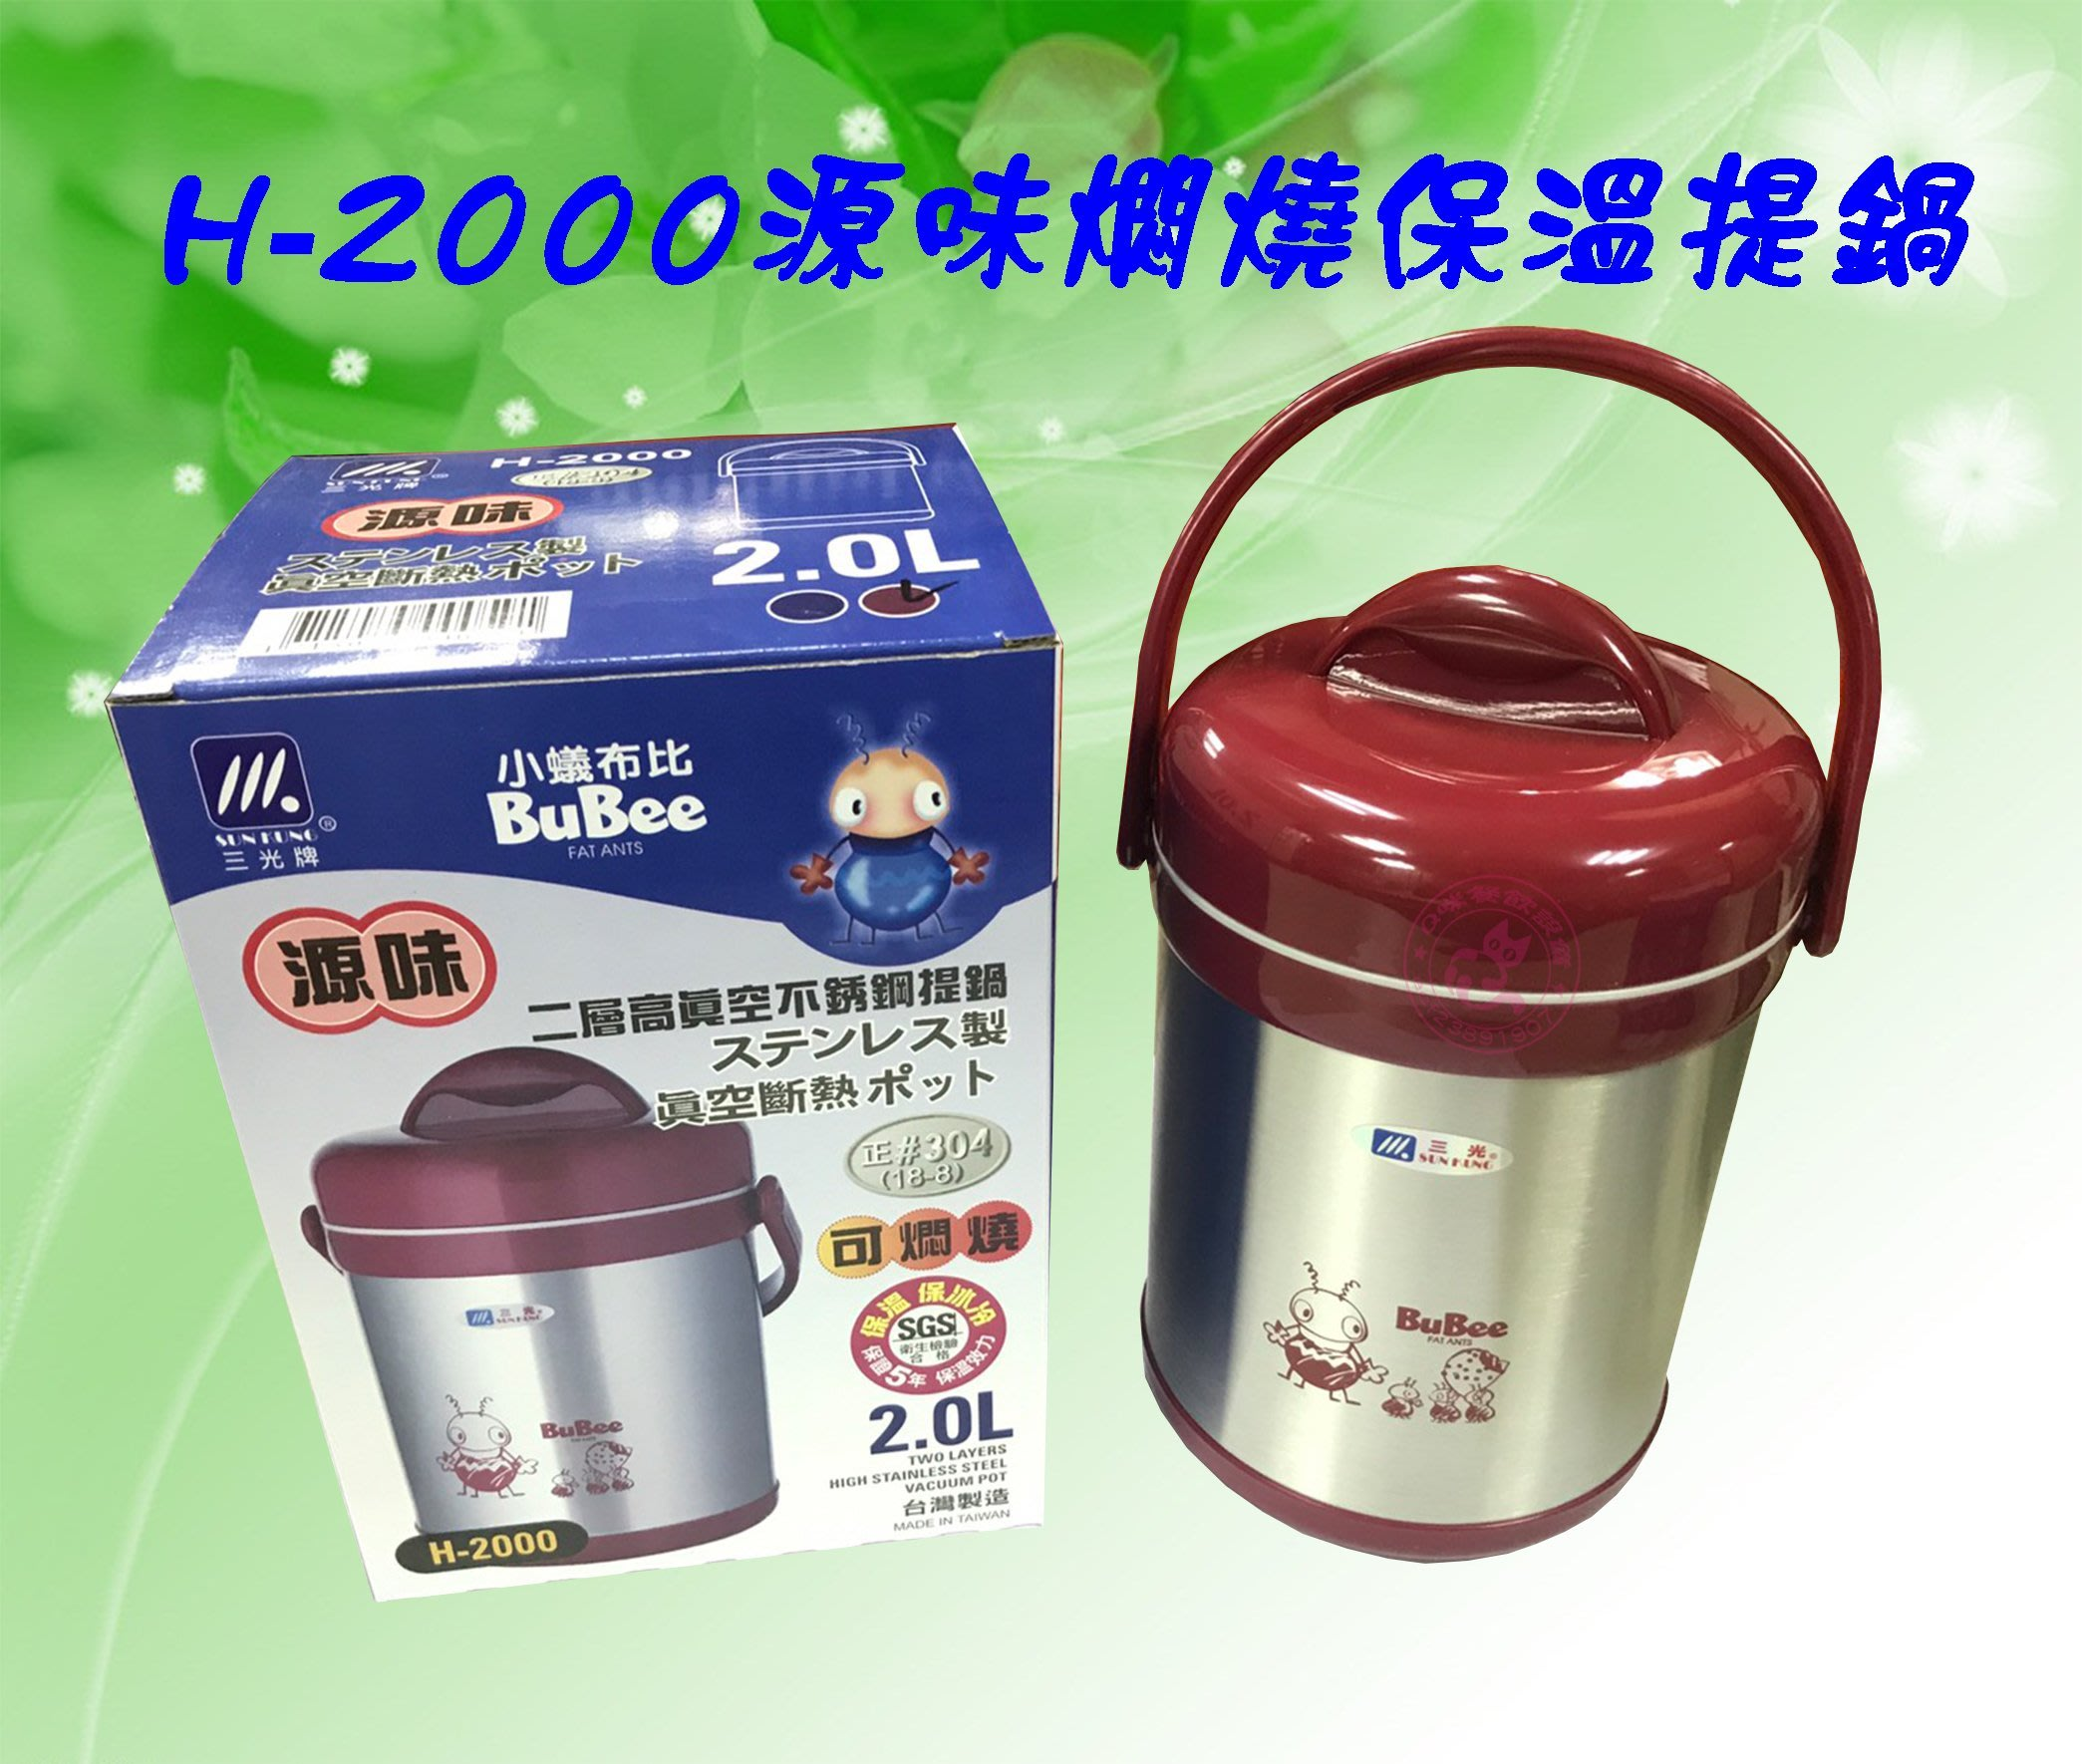 【Q咪餐飲設備】(三光牌)2L雙層真空不銹鋼提鍋/H-2000源味保溫飯盒/便當盒/飯盒